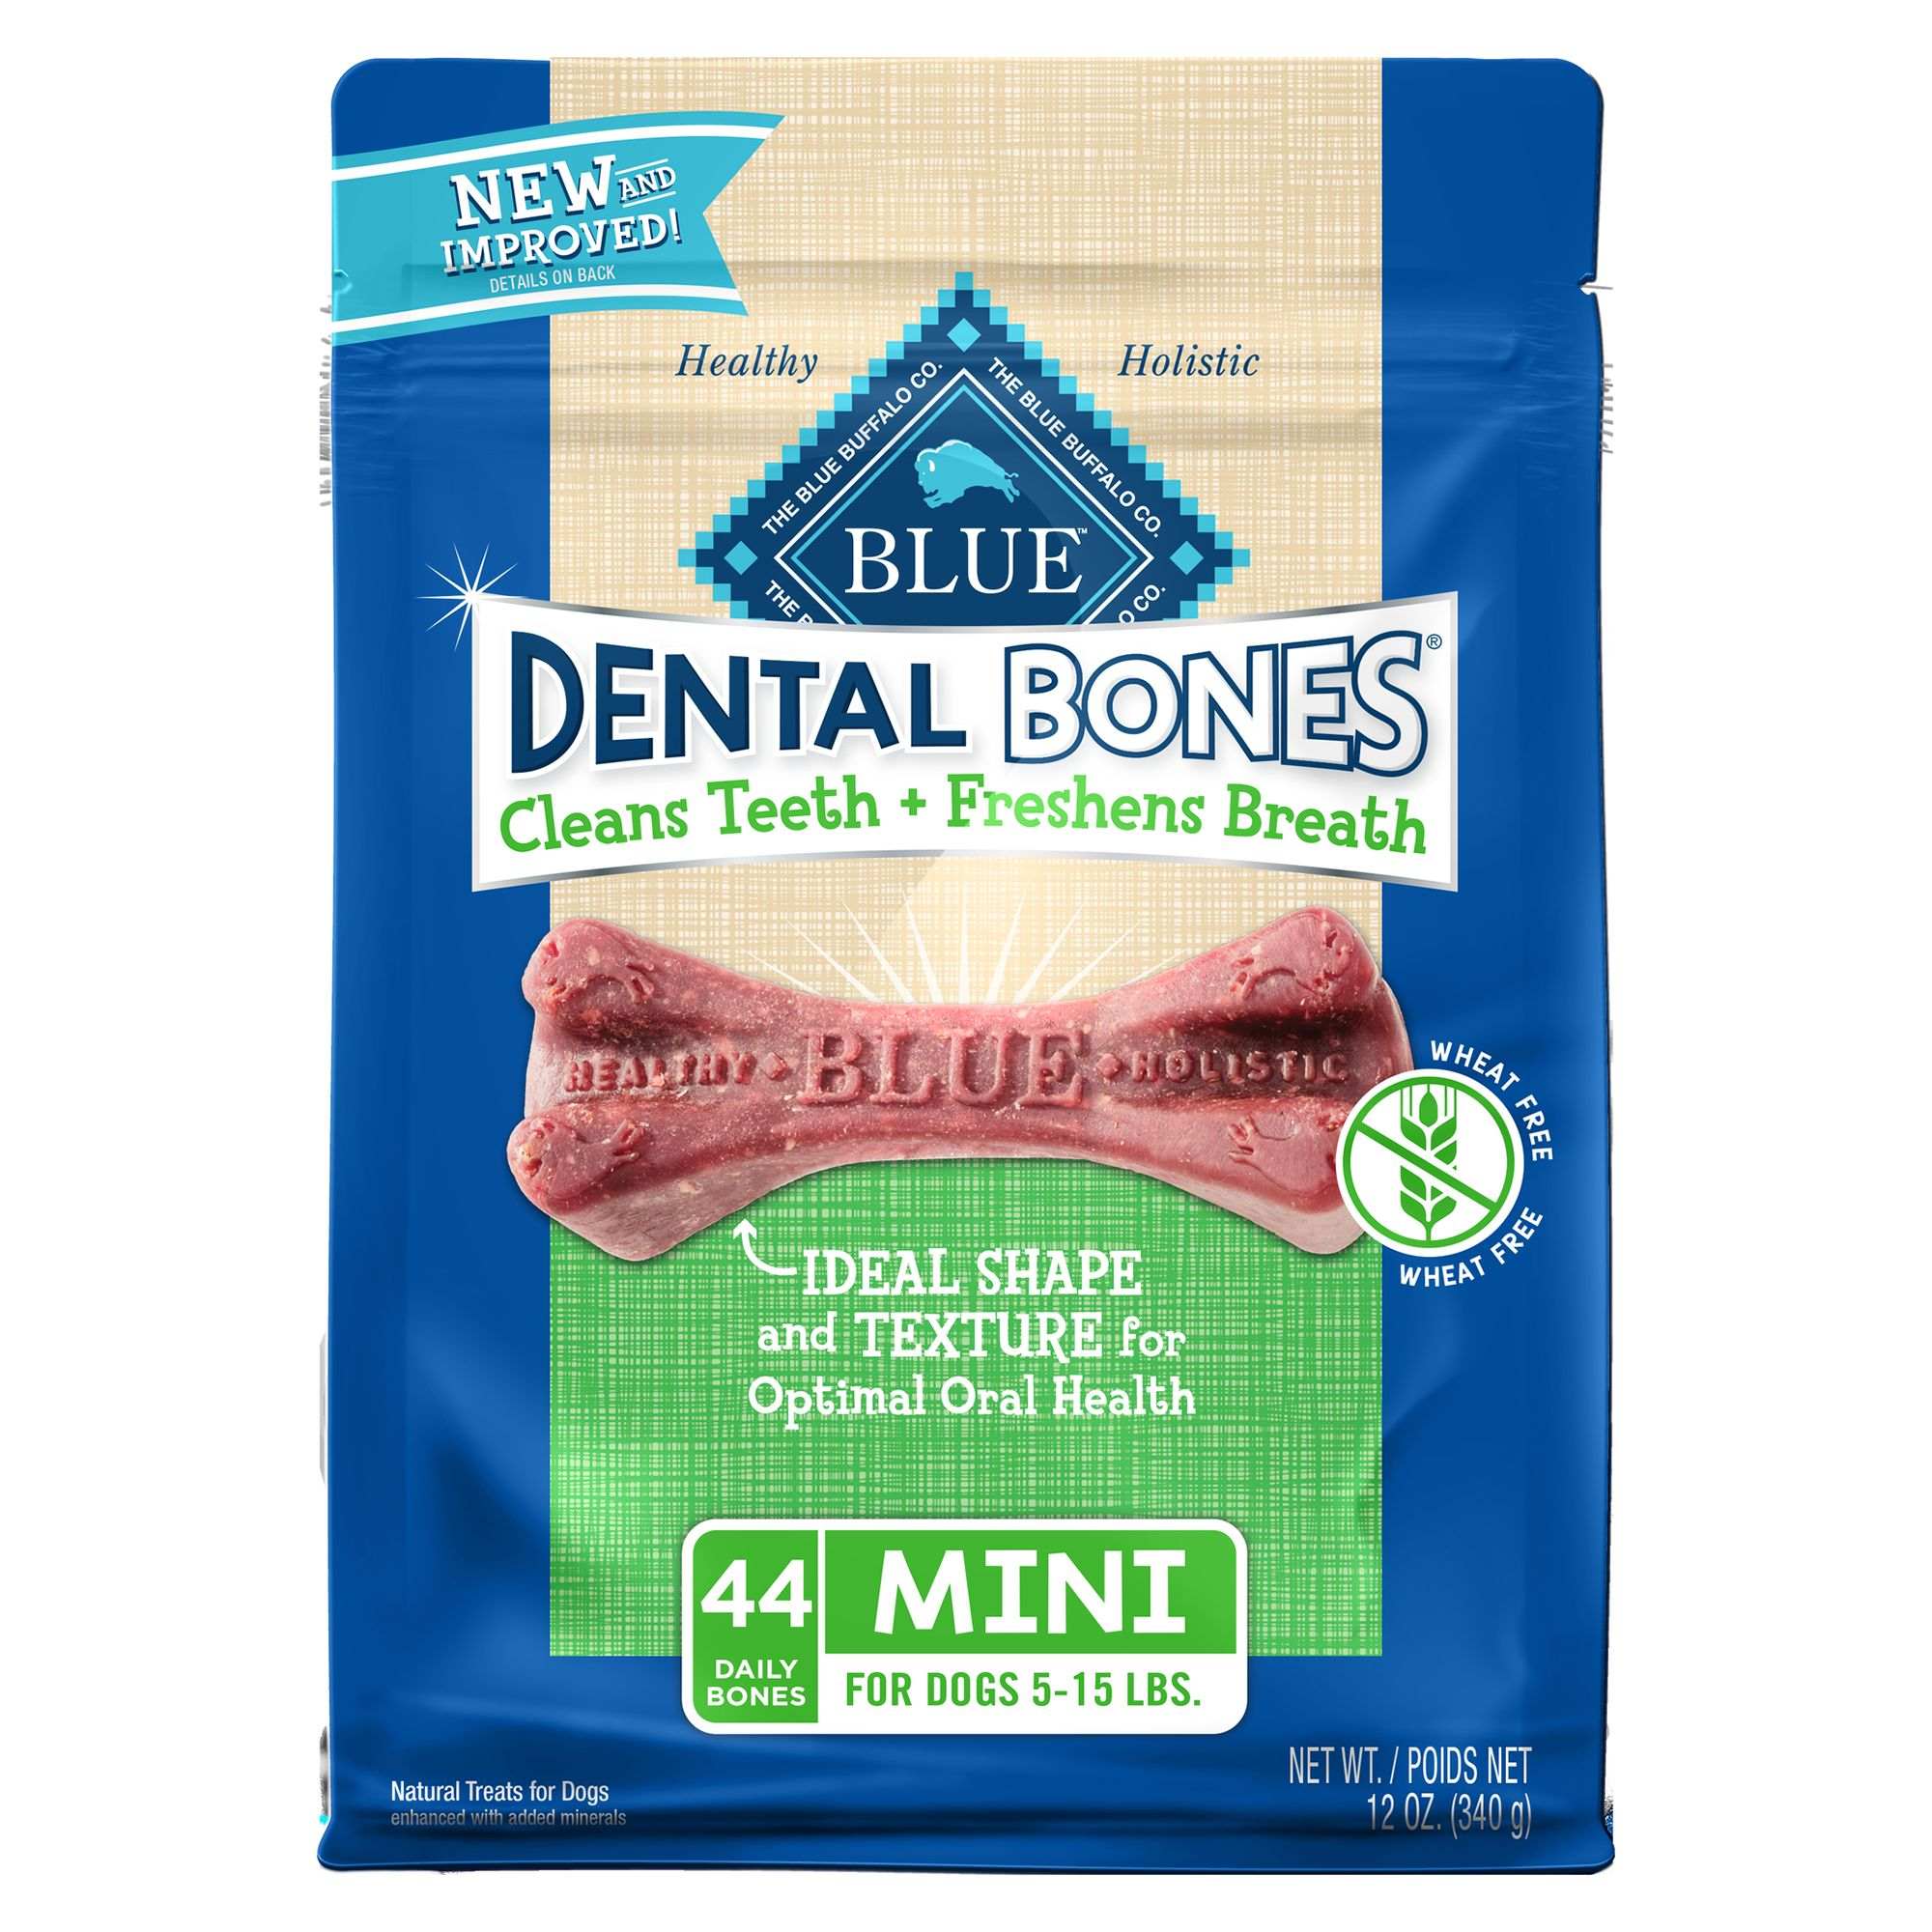 Blue Dental Bones, Mini Dog Treat - Natural size: 12 Oz, Blue Buffalo, Adult, Potato